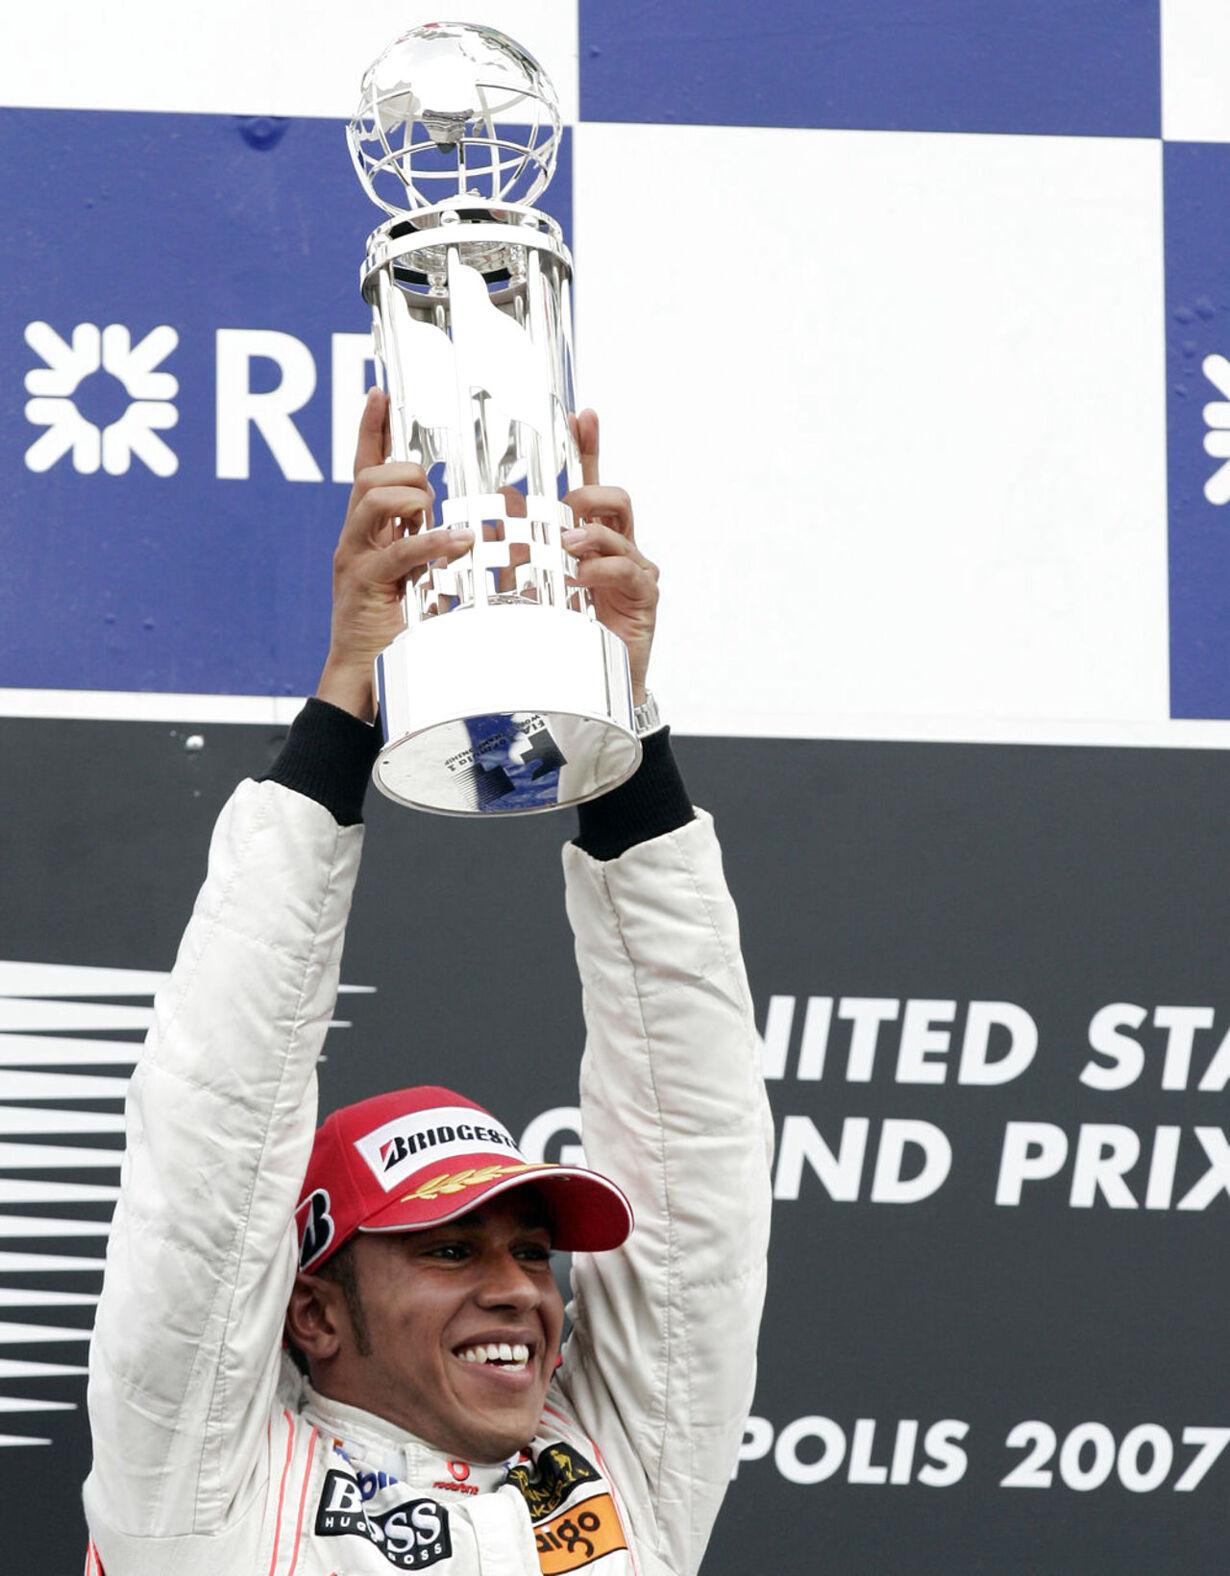 AUTO-F1-USA-HAMILTON